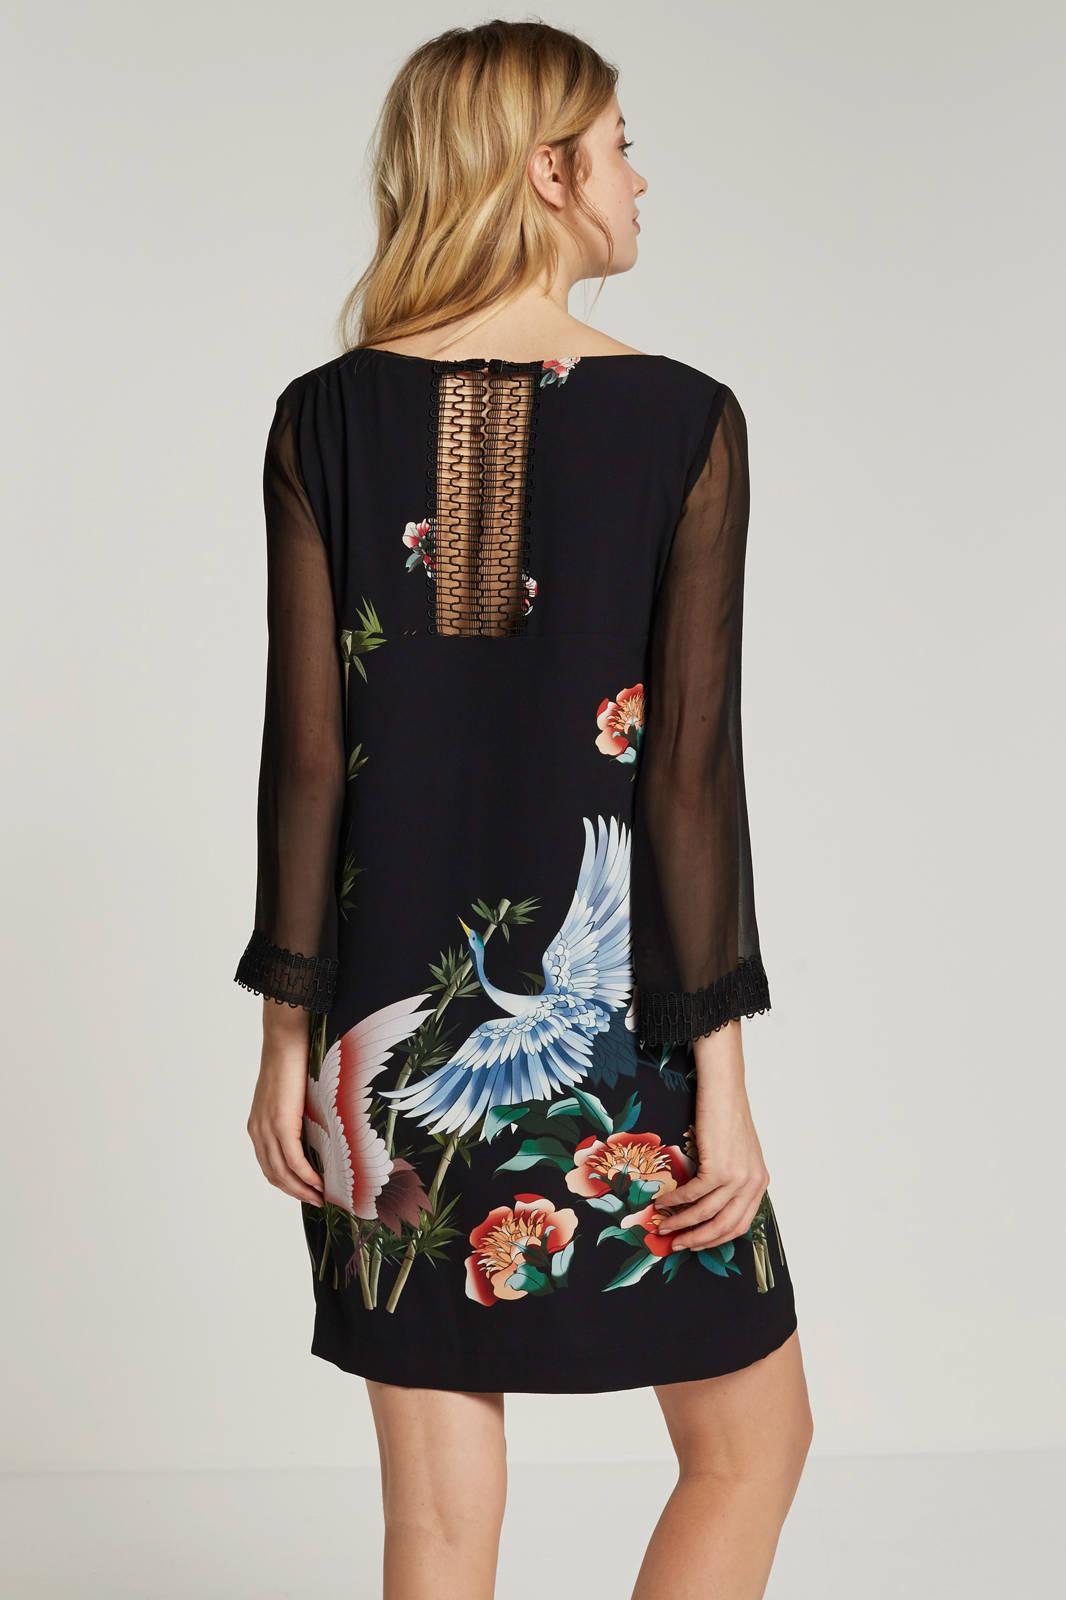 c94a5c25e8bbcd Ana Alcazar jurk met vogelprint